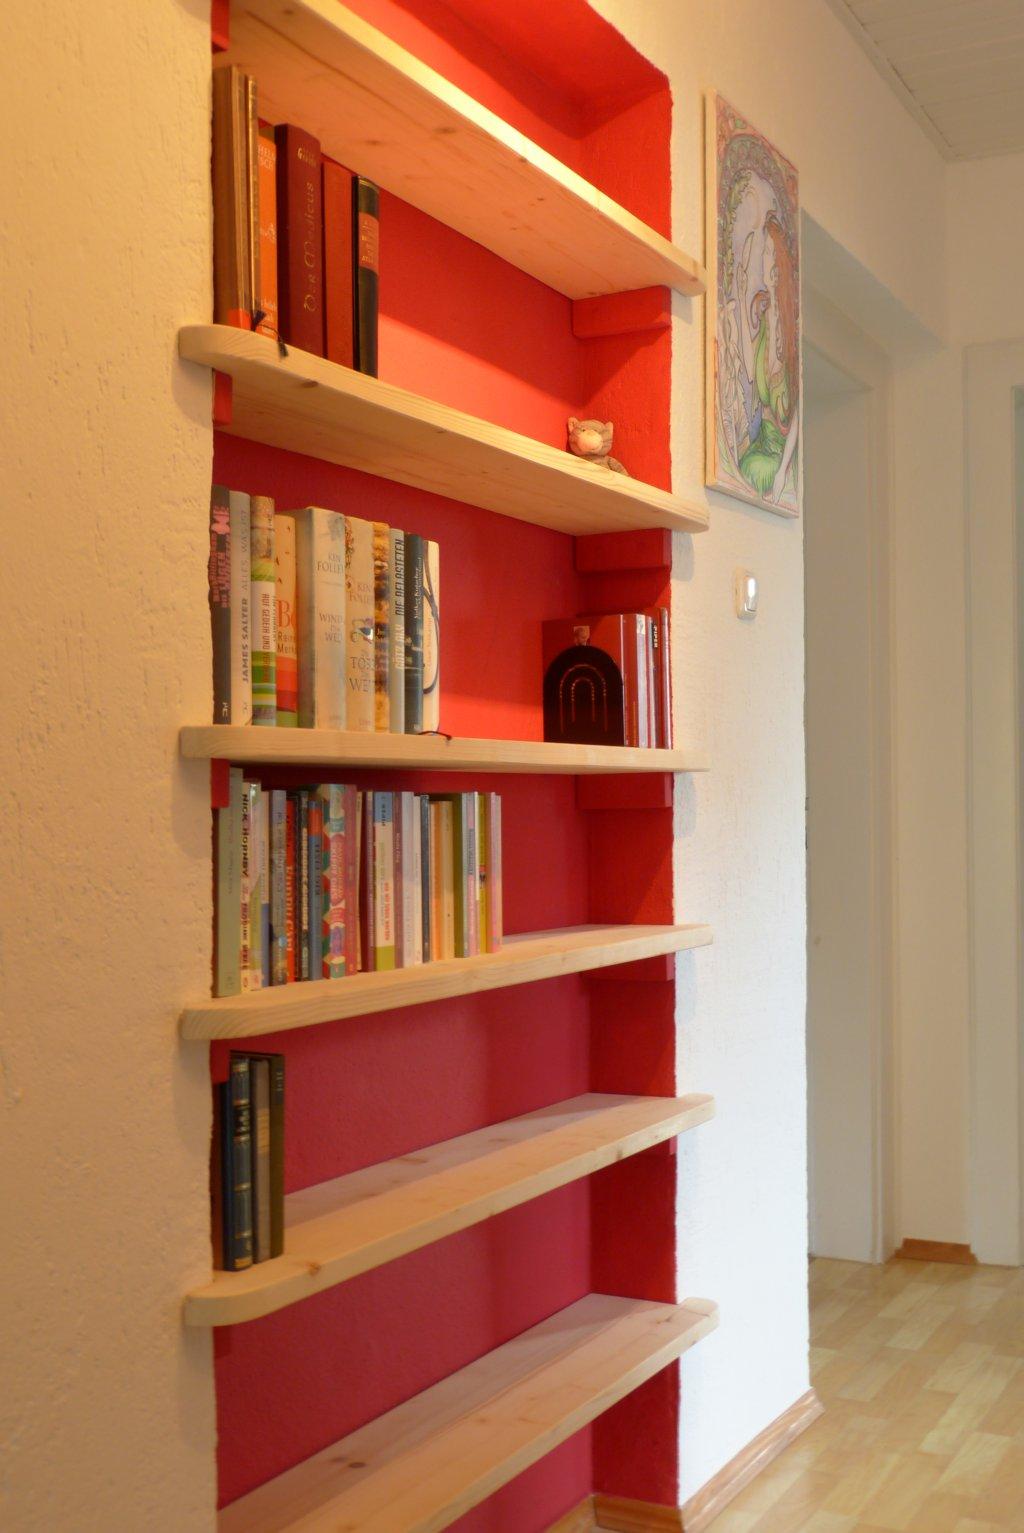 martin 39 s tuckerbag september 2015. Black Bedroom Furniture Sets. Home Design Ideas